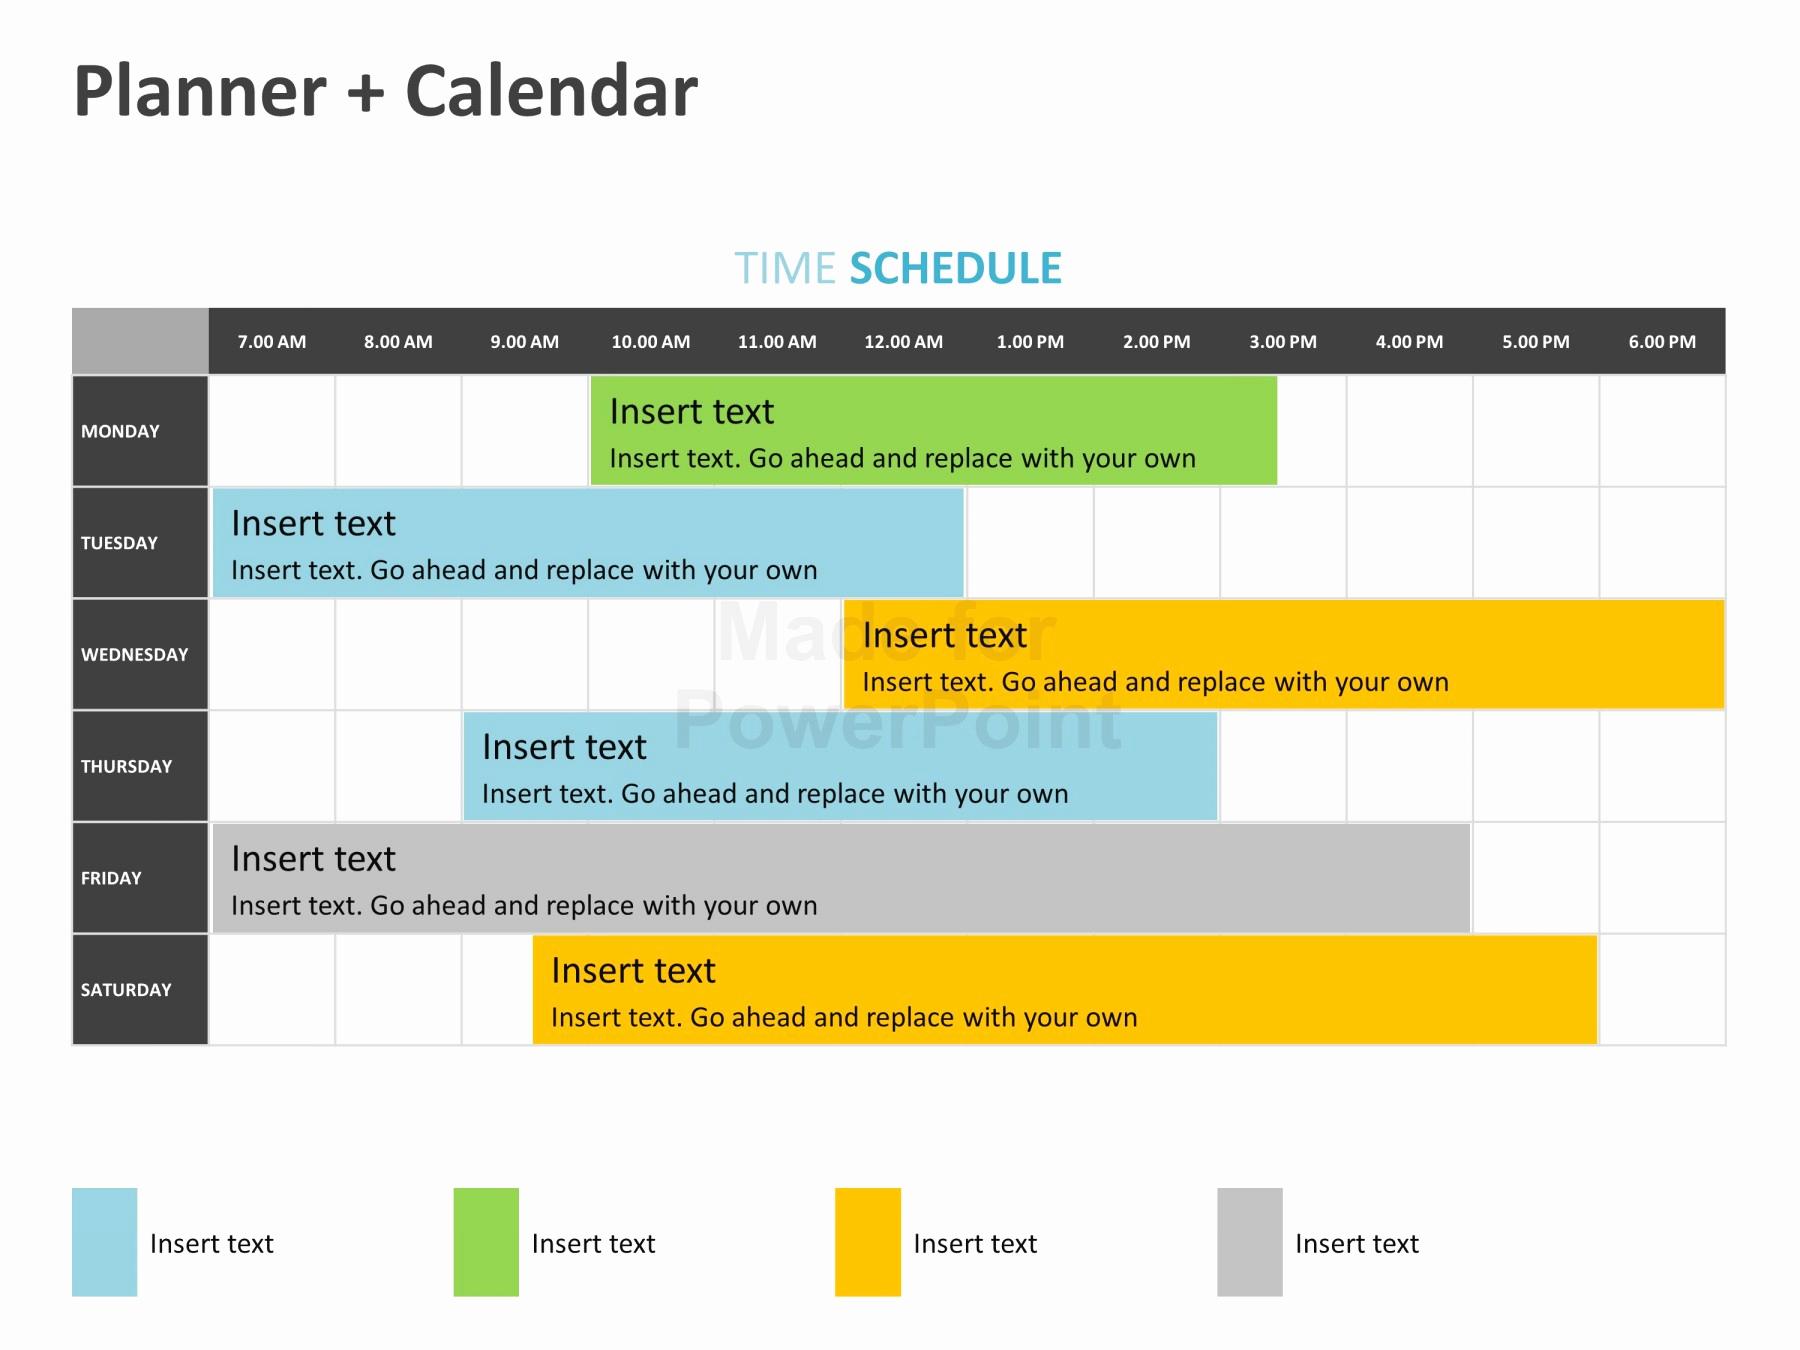 Power Point Calendar Templates Unique Planner Calendar Editable Powerpoint Template